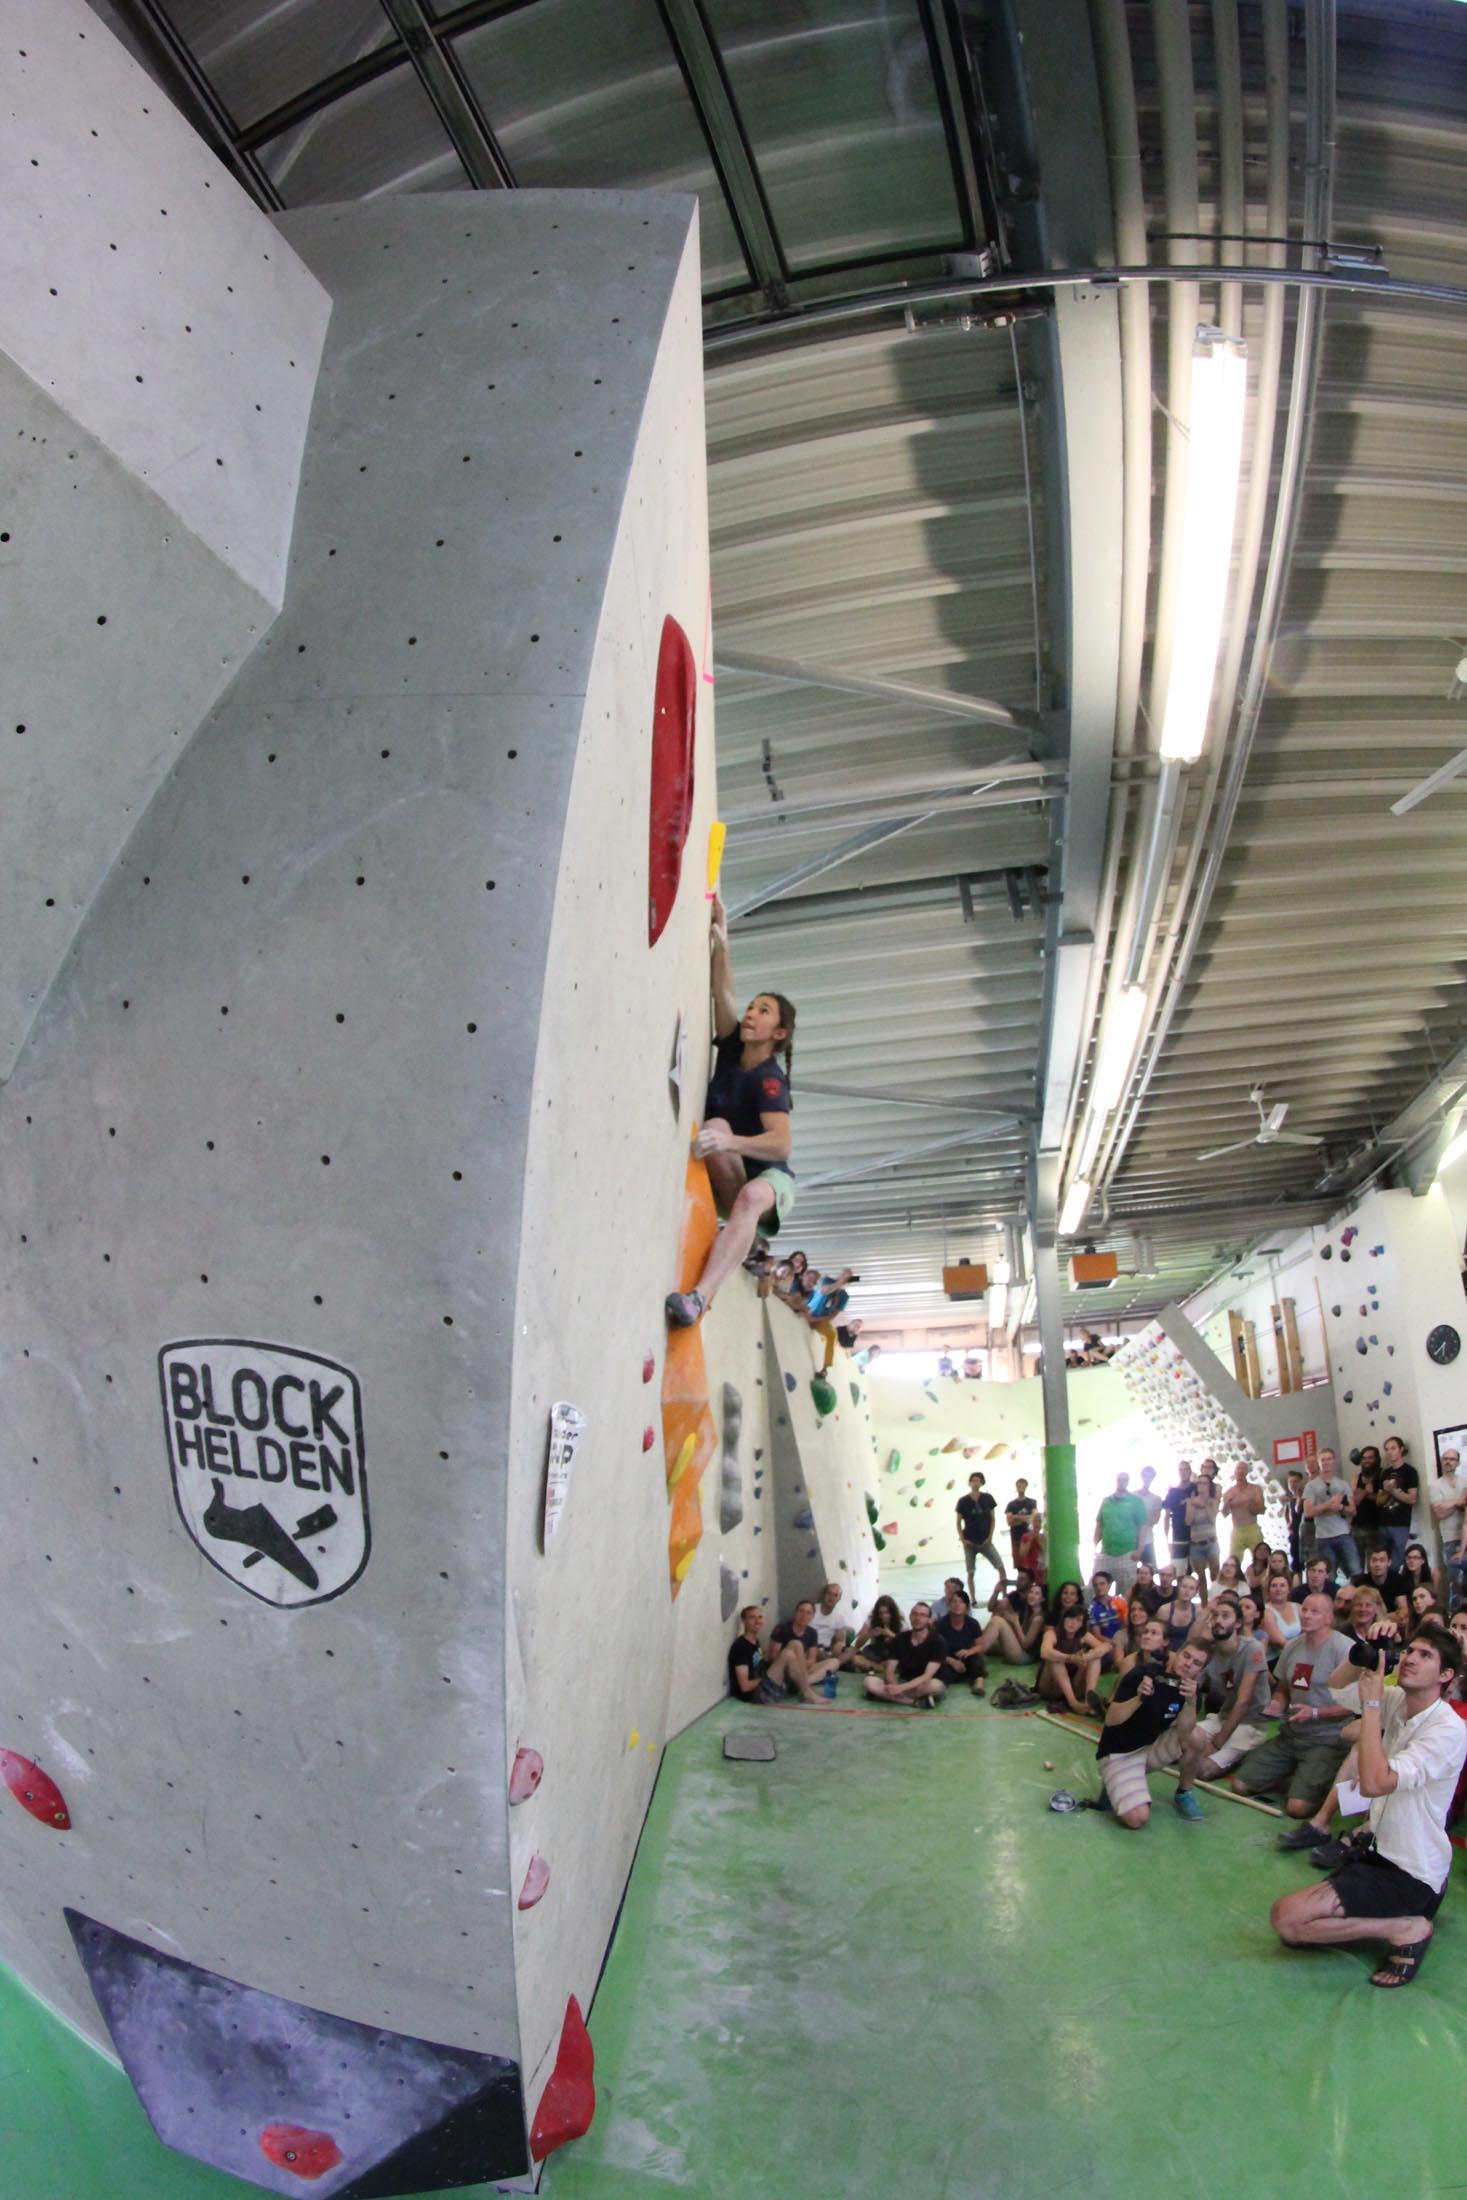 Finale, internationaler bouldercup Frankenjura 2016, BLOCKHELDEN Erlangen, Mammut, Bergfreunde.de, Boulderwettkampf07092016479